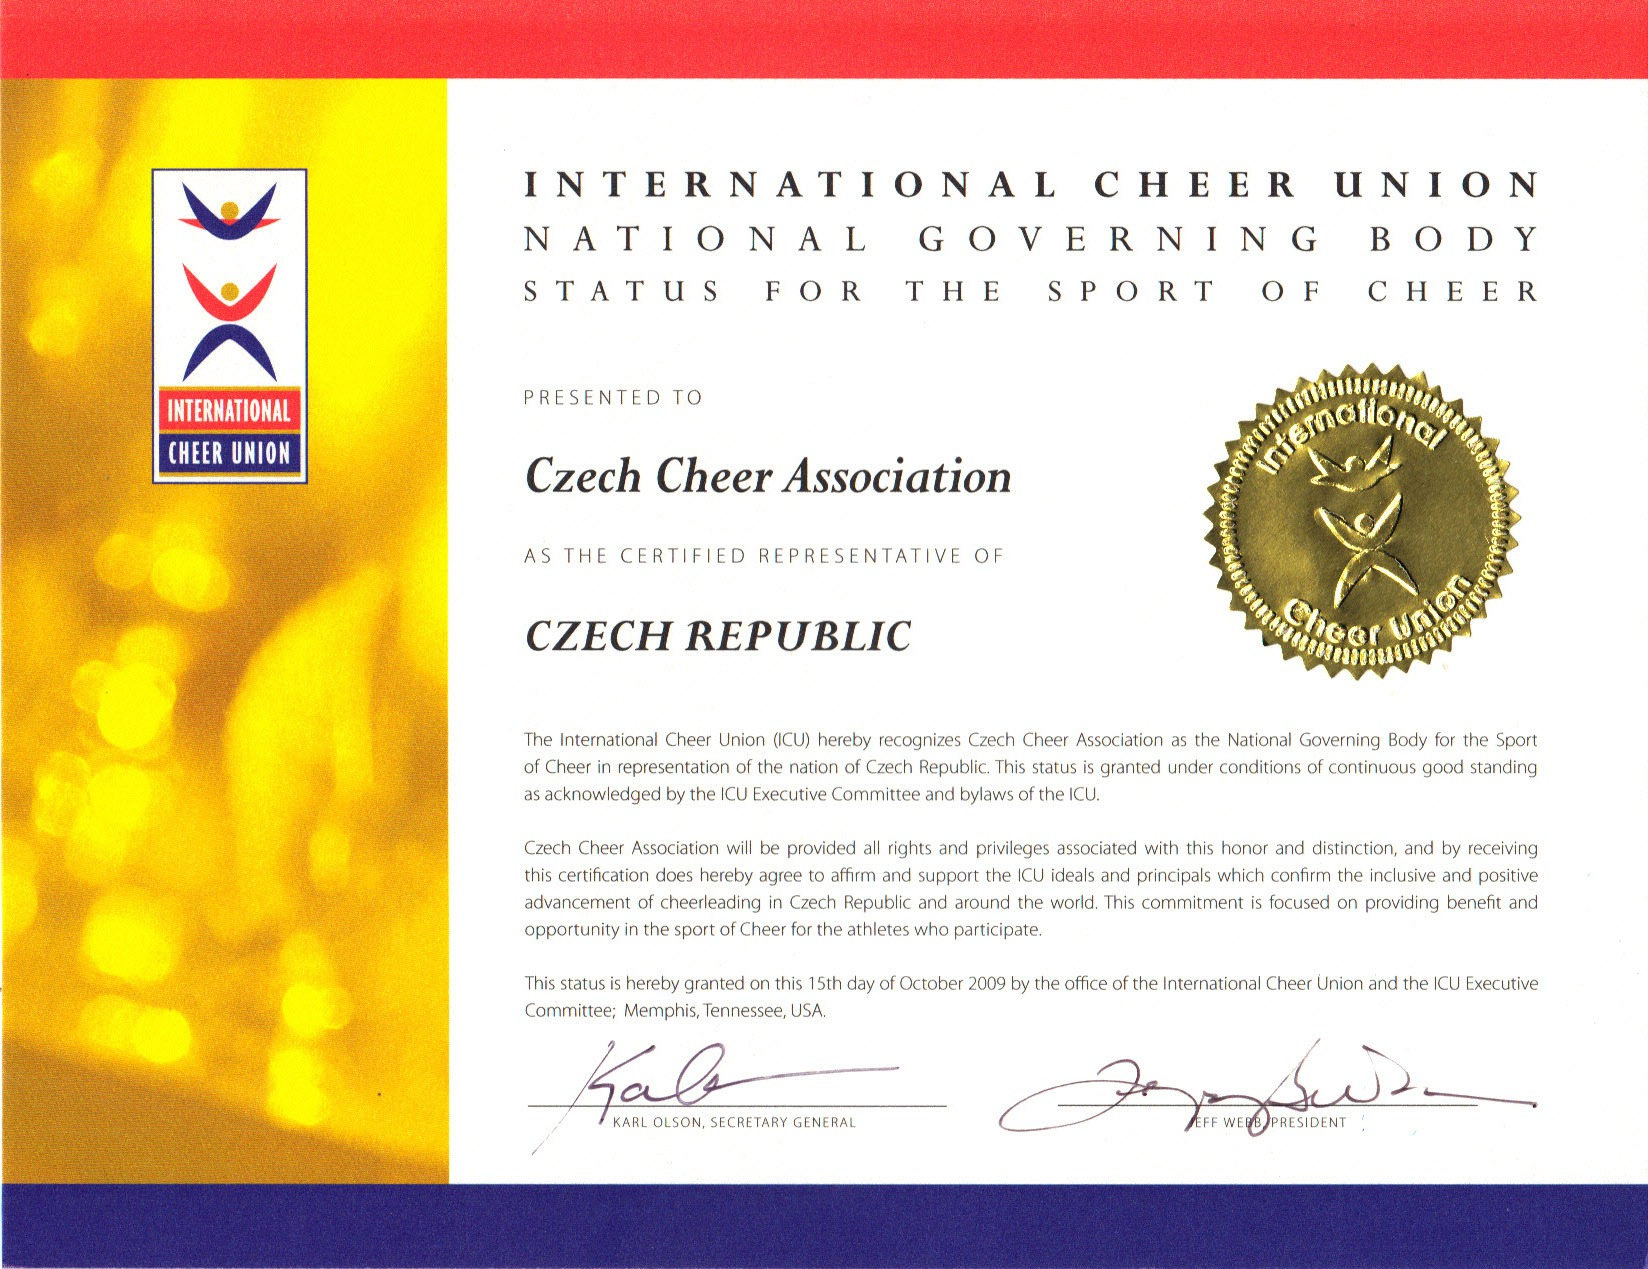 The recognized world governing body of cheerleading europe icu tafisa membership letter altavistaventures Gallery